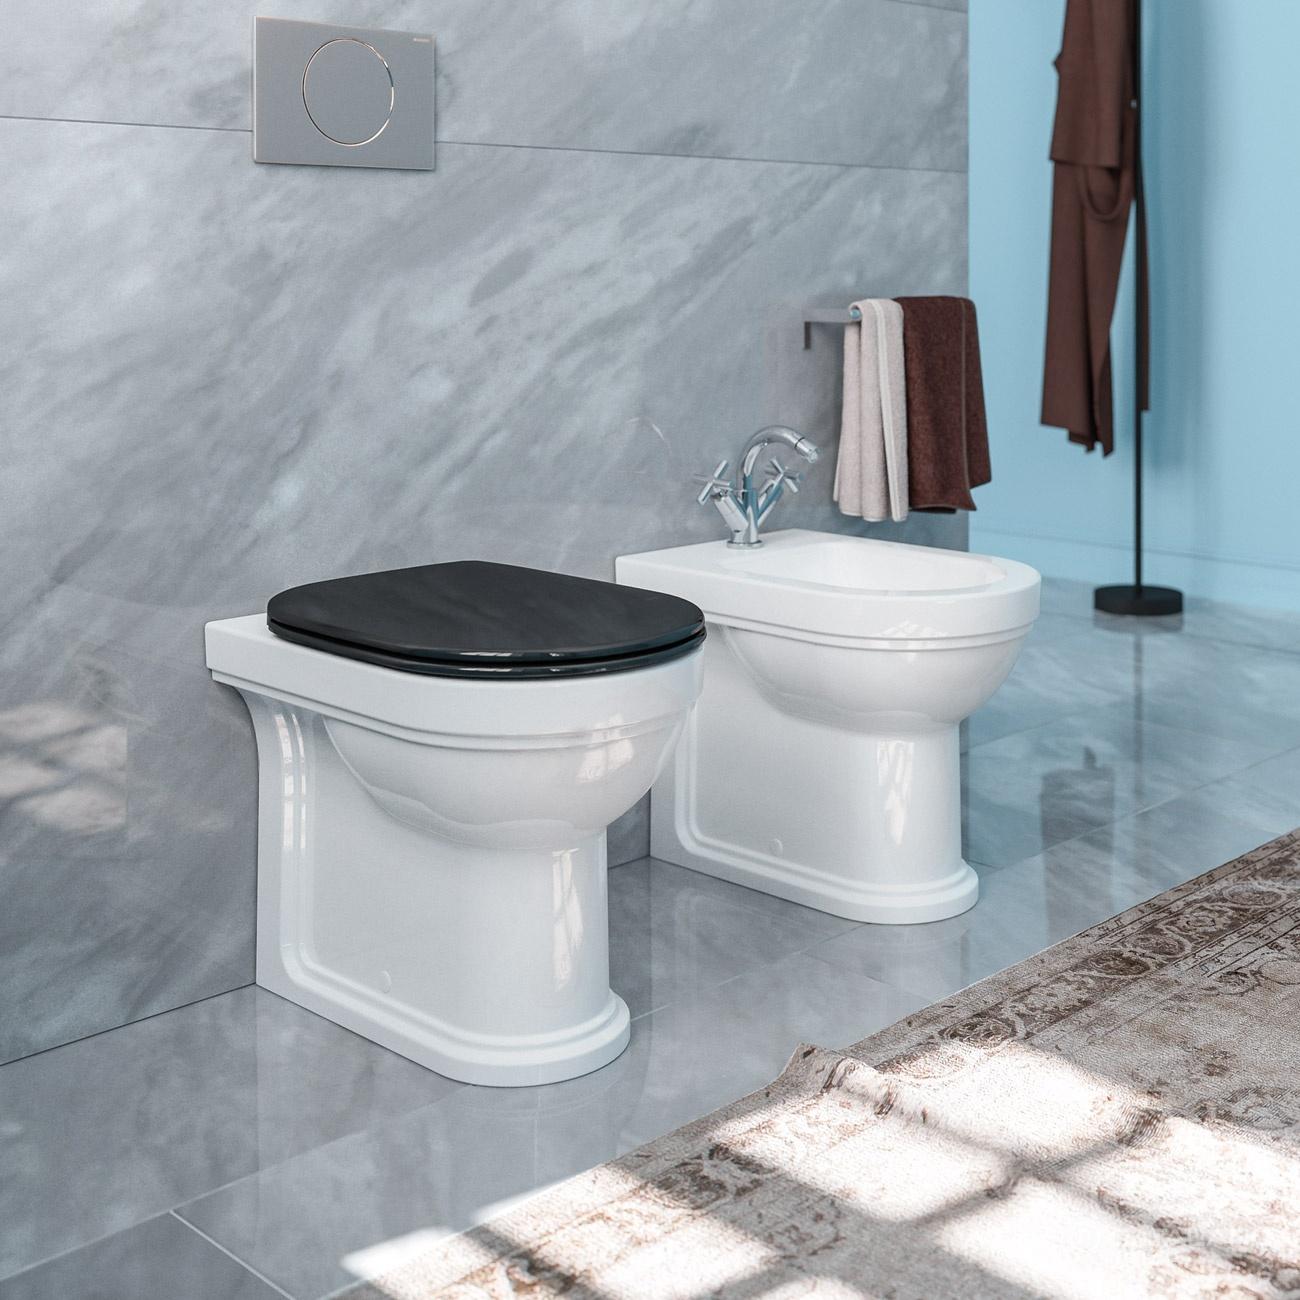 toilet seats with bidet